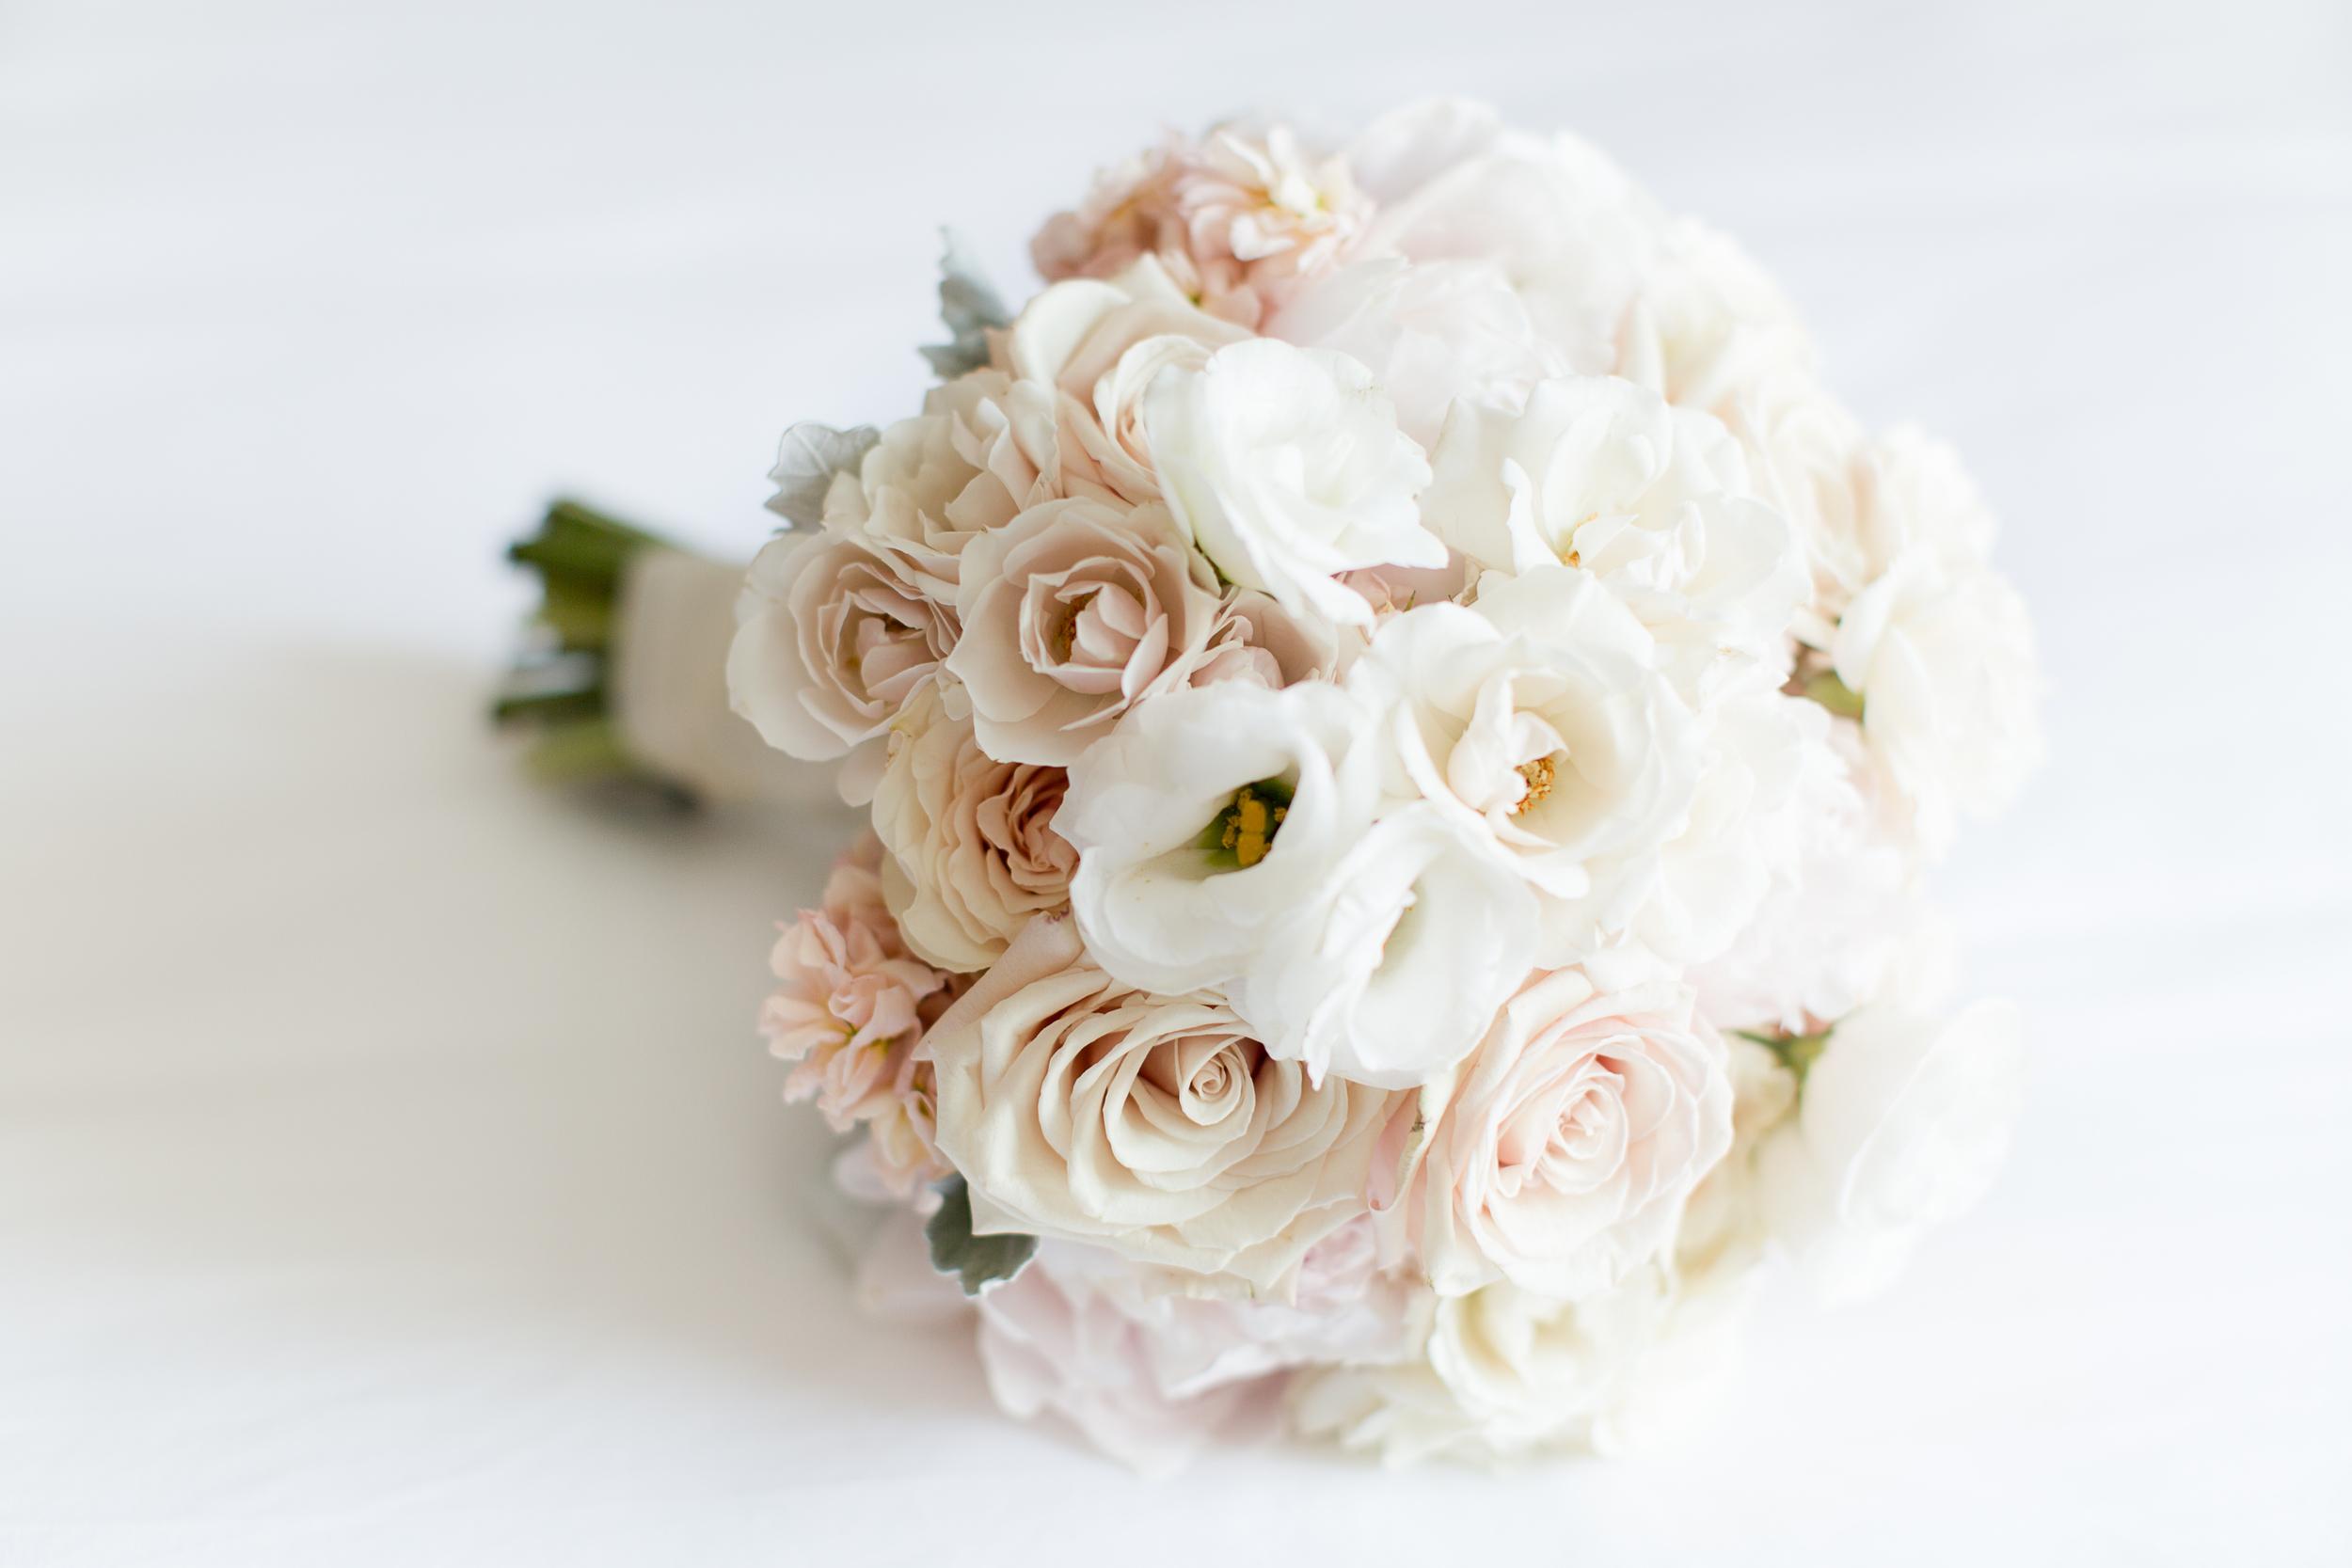 Melissa Kruse Photography - Genna + Anthony The Loading Dock Stamford CT Wedding-32.jpg